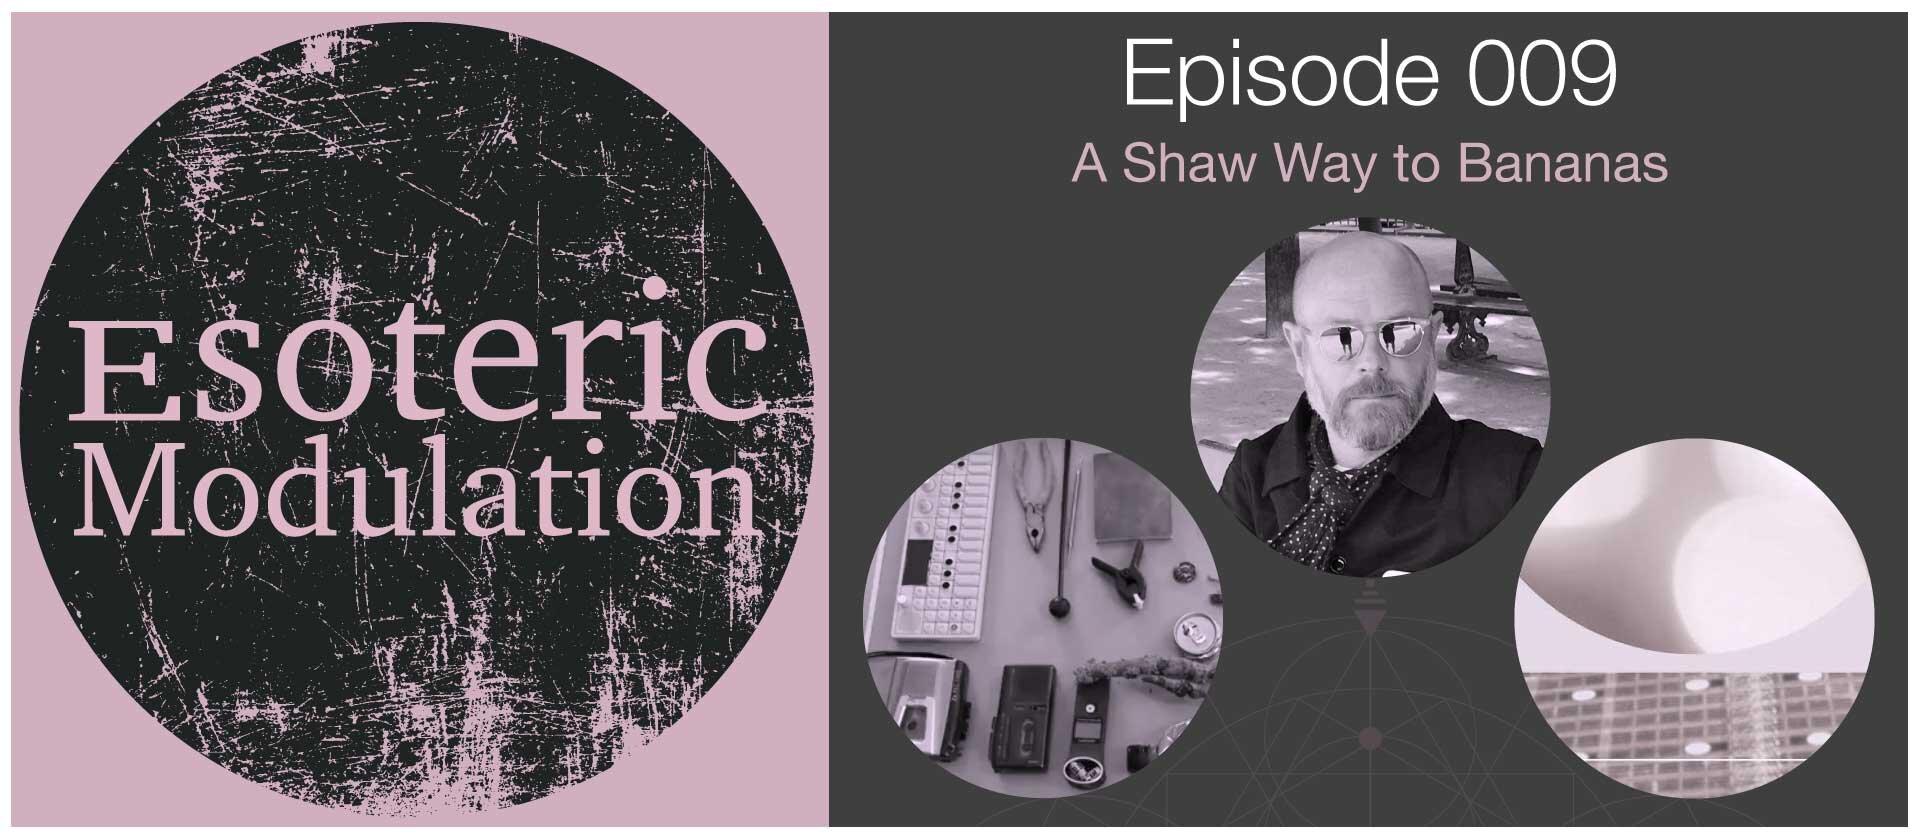 Esoteric-Modulation-episode-9--A-Shaw-Way-to-Bananas.jpg